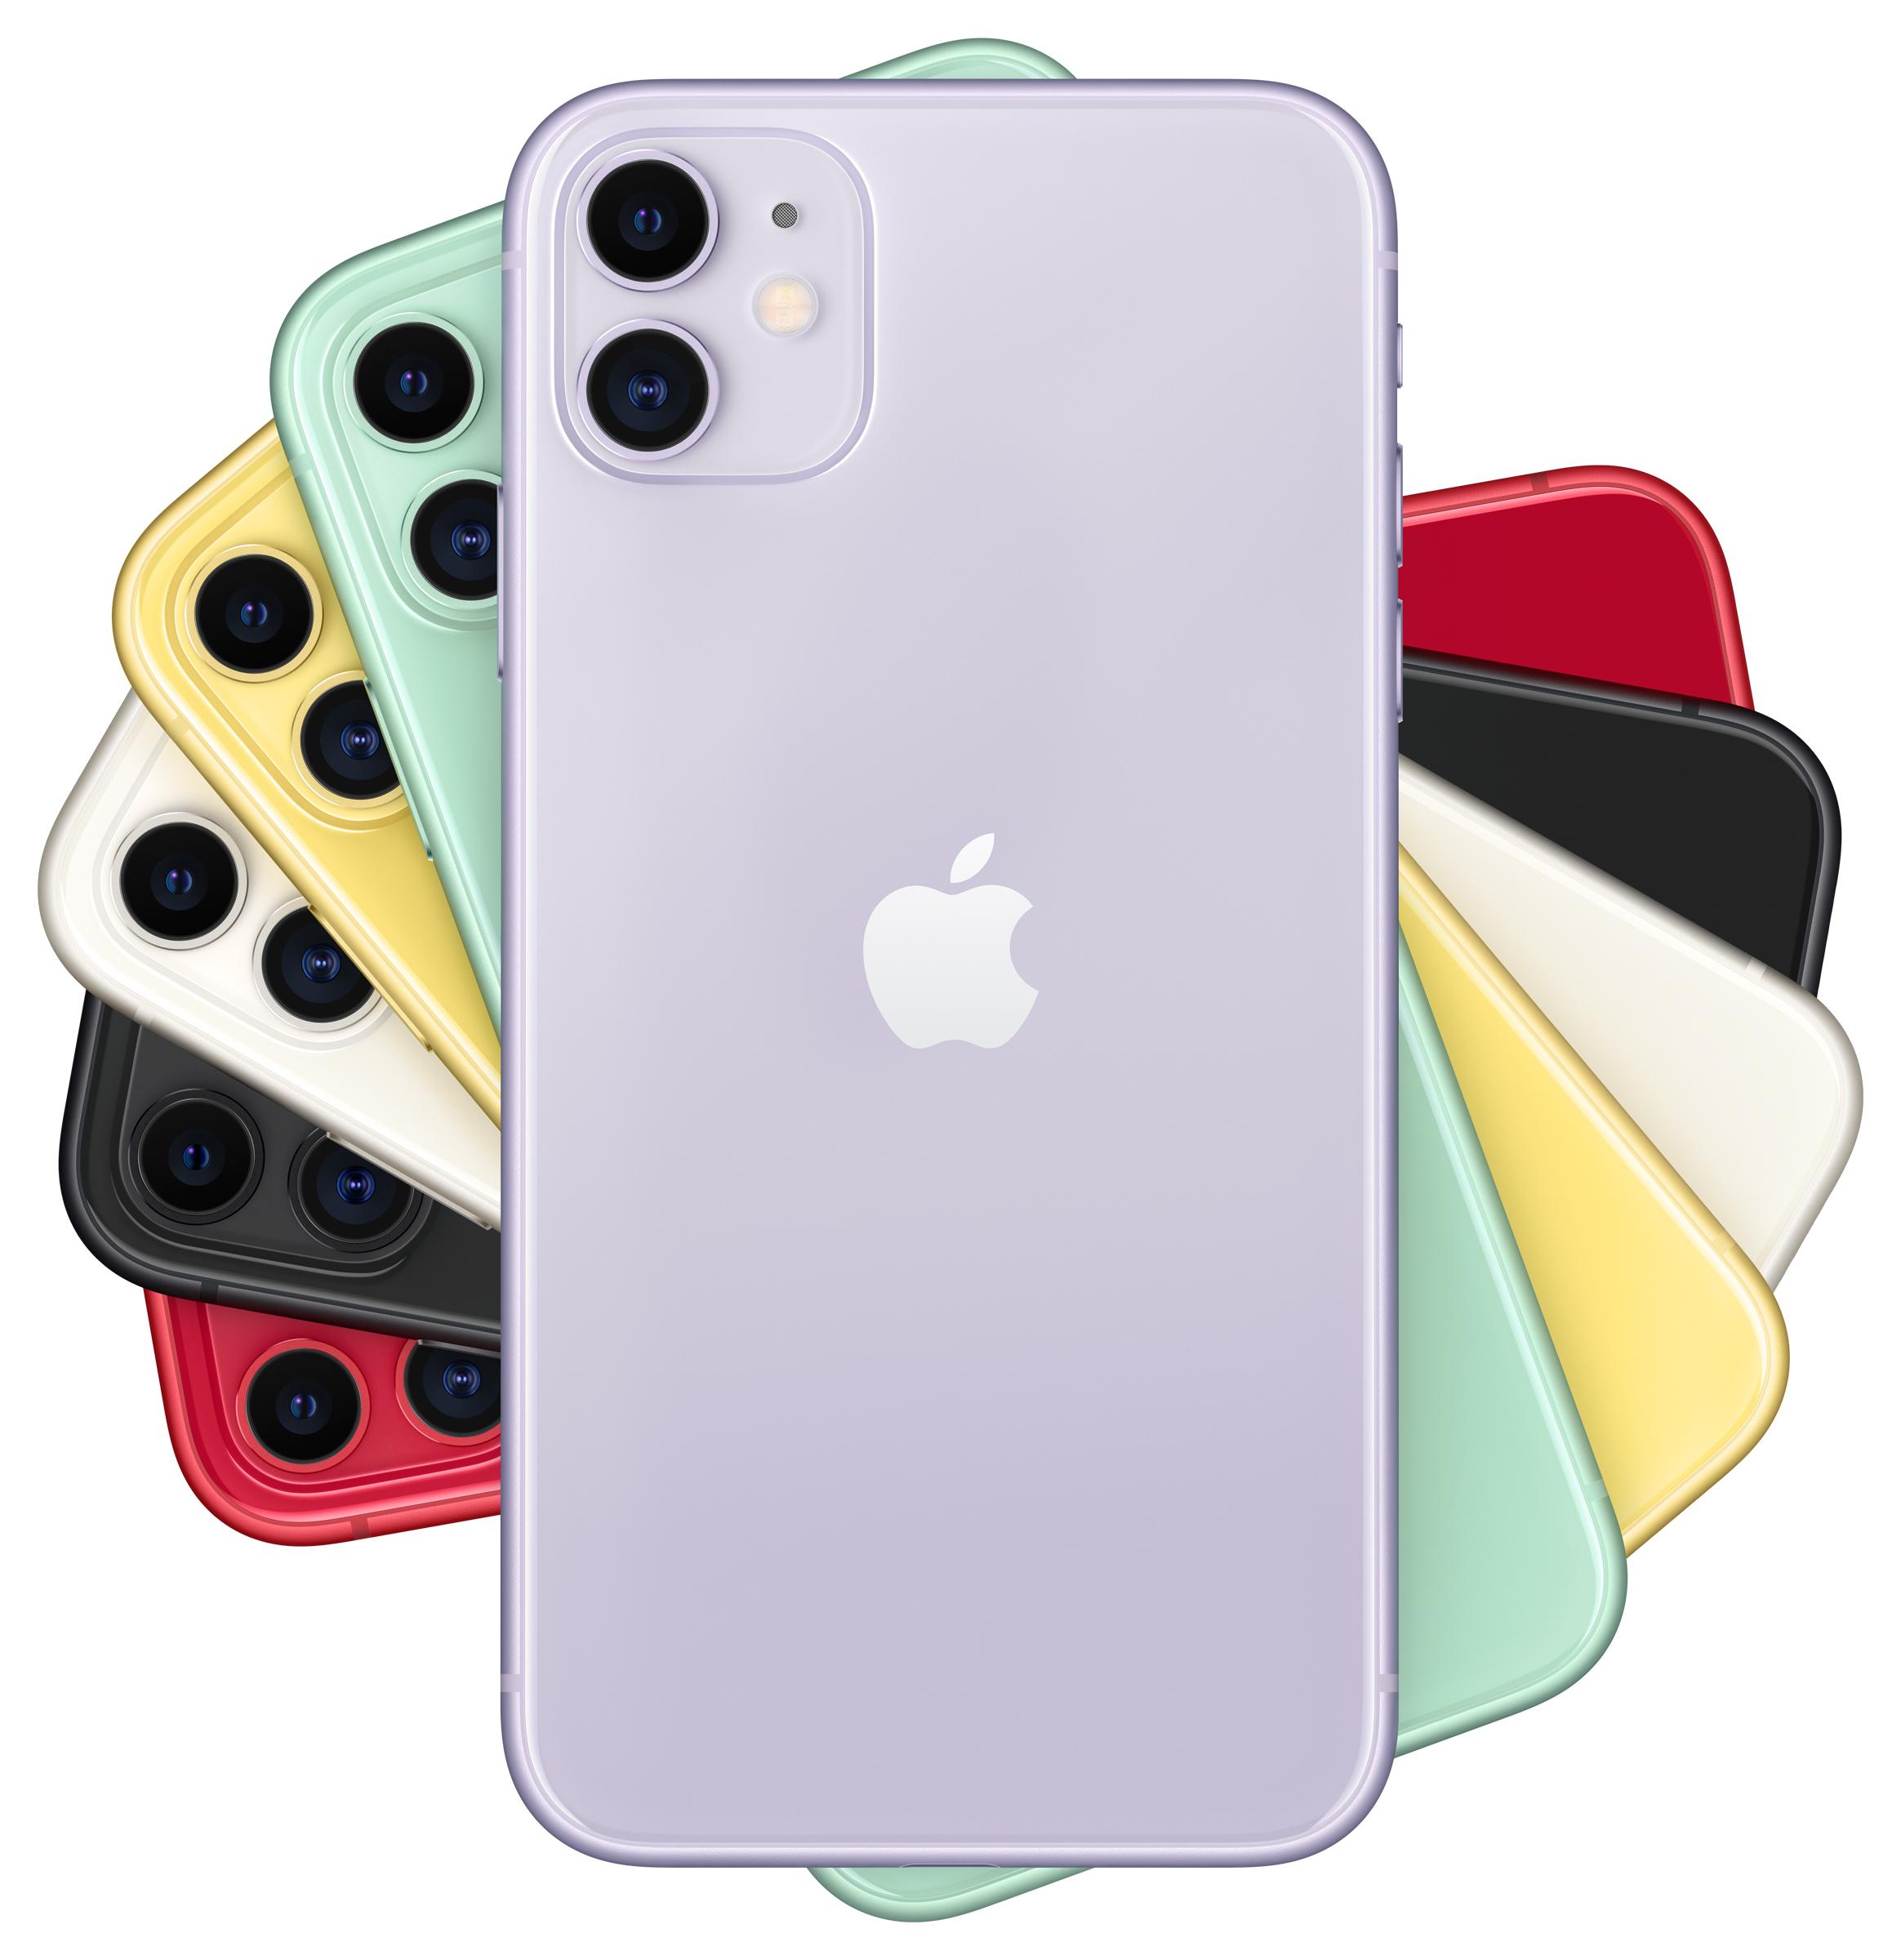 iPhone 11 image